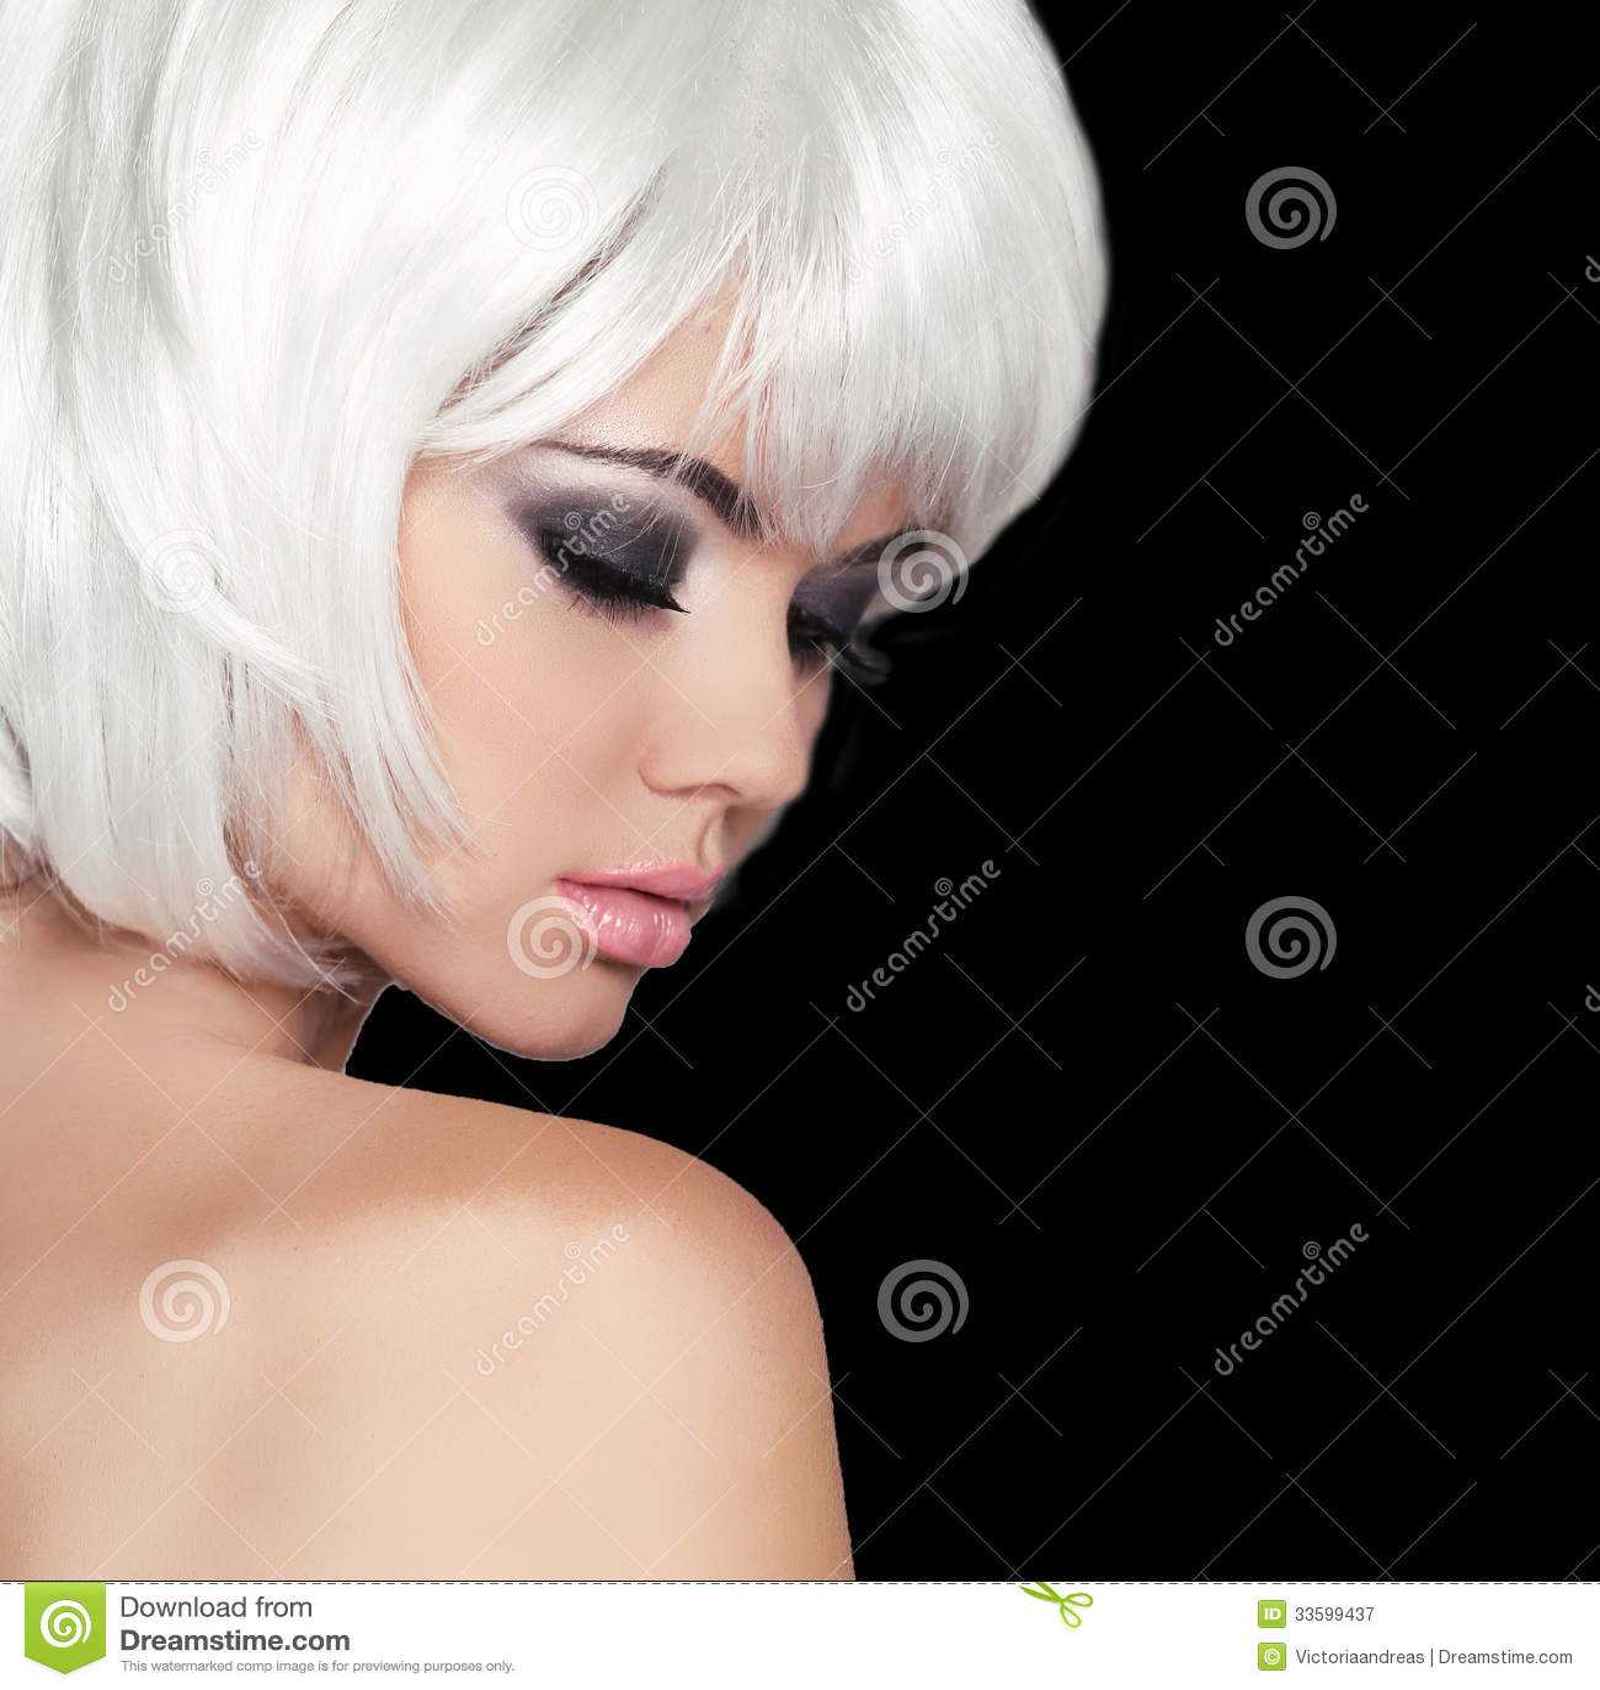 Fashion Beauty Portrait Woman White Short Hair Isolated Bla Stock Image